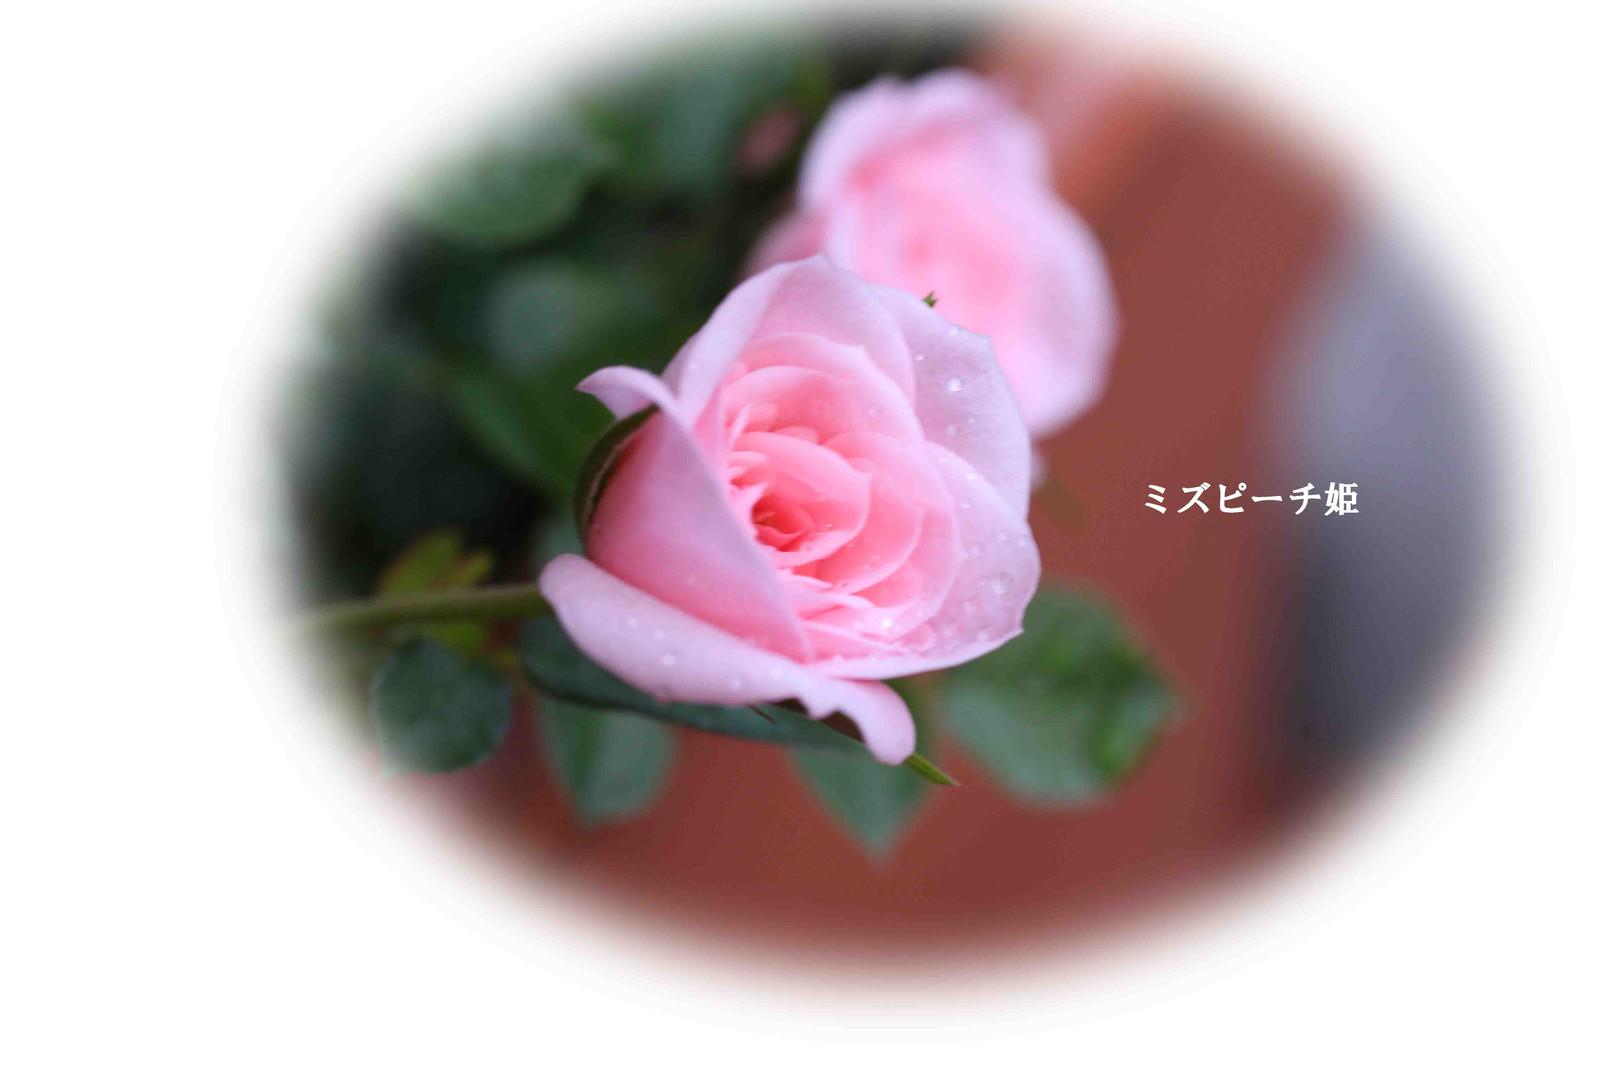 2015_05_09_9214_edited1